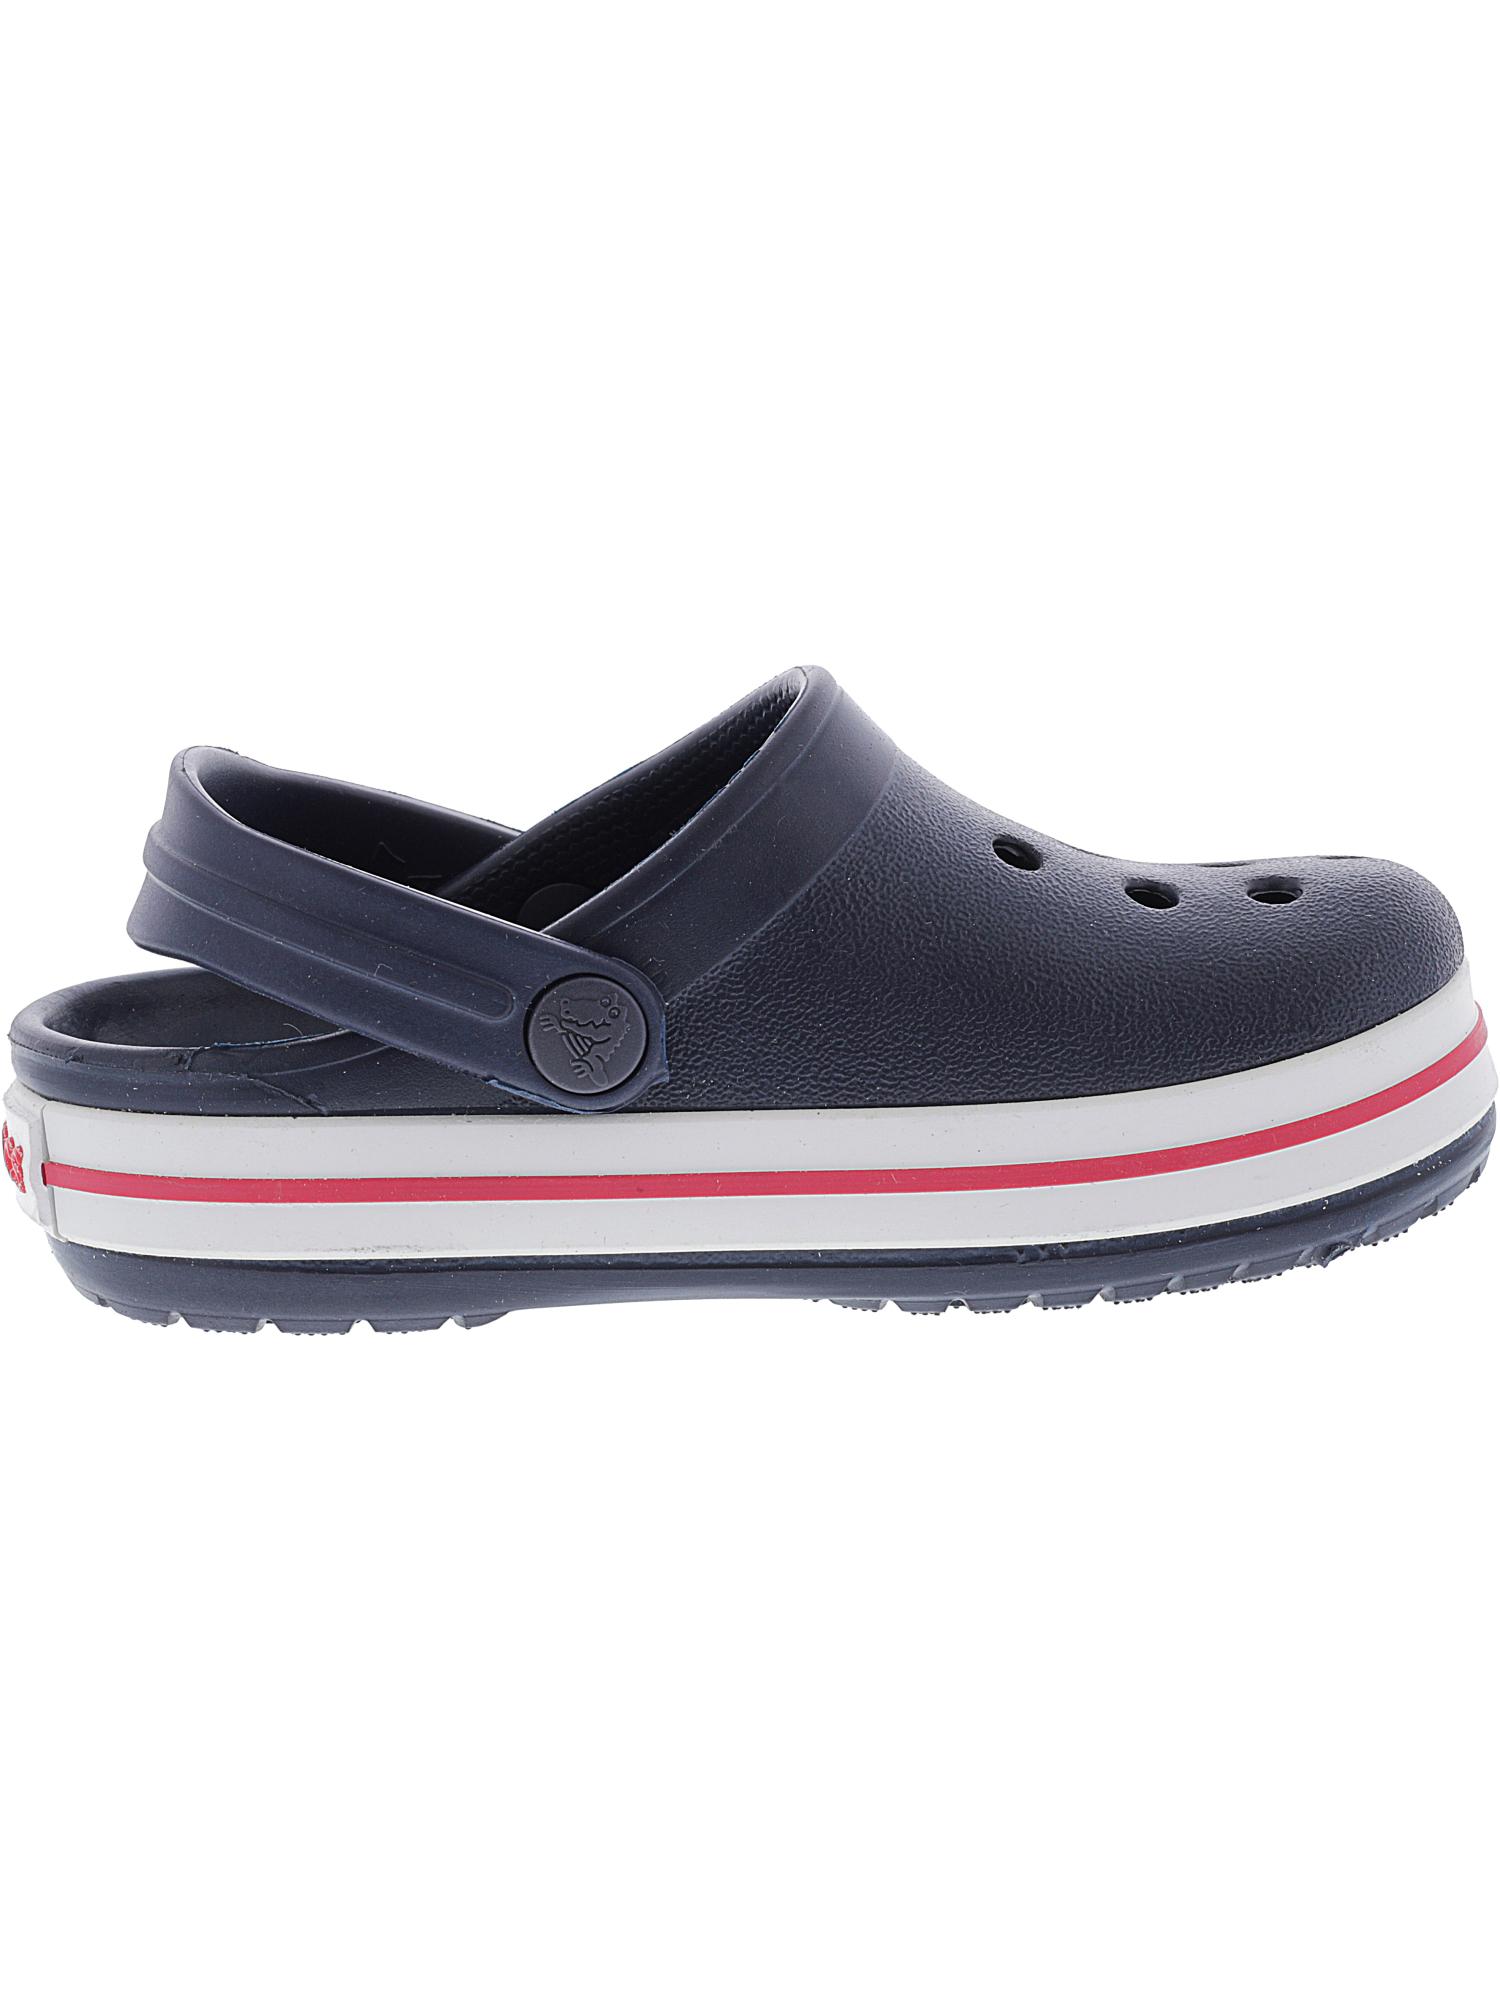 Crocs-Kids-Crocband-Clog-Ltd-Clogs Indexbild 8